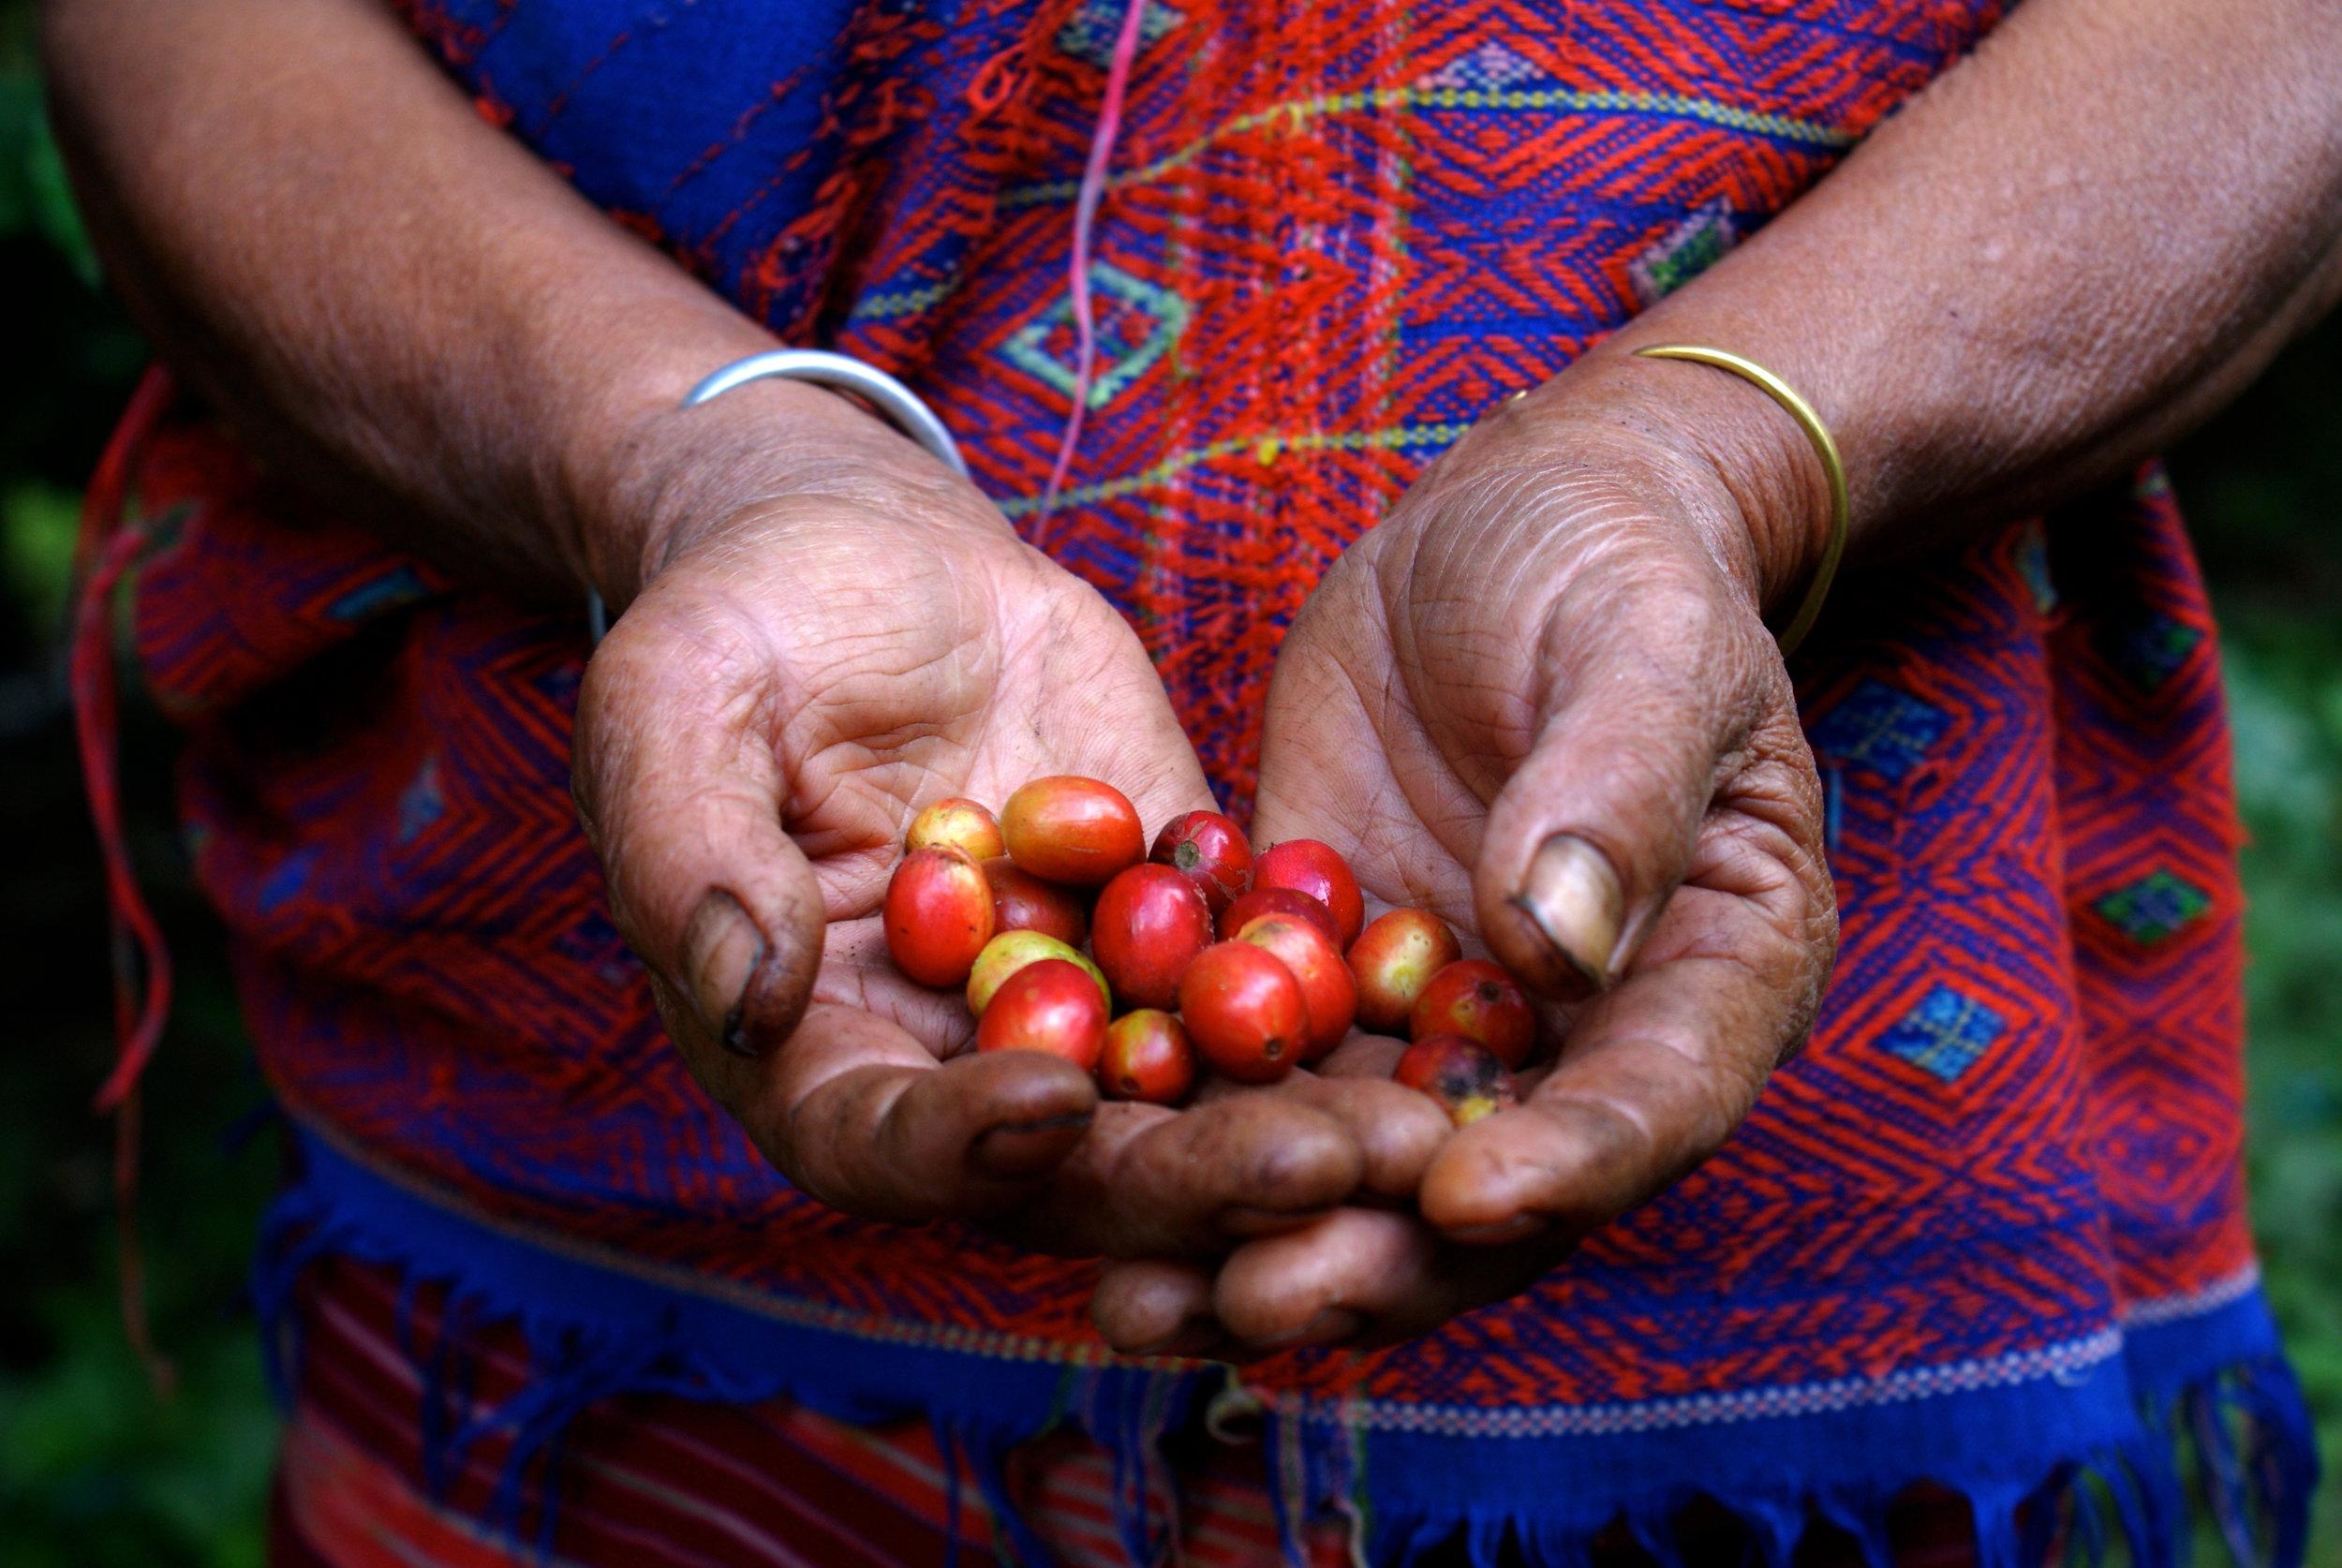 Hand picked coffee cherries